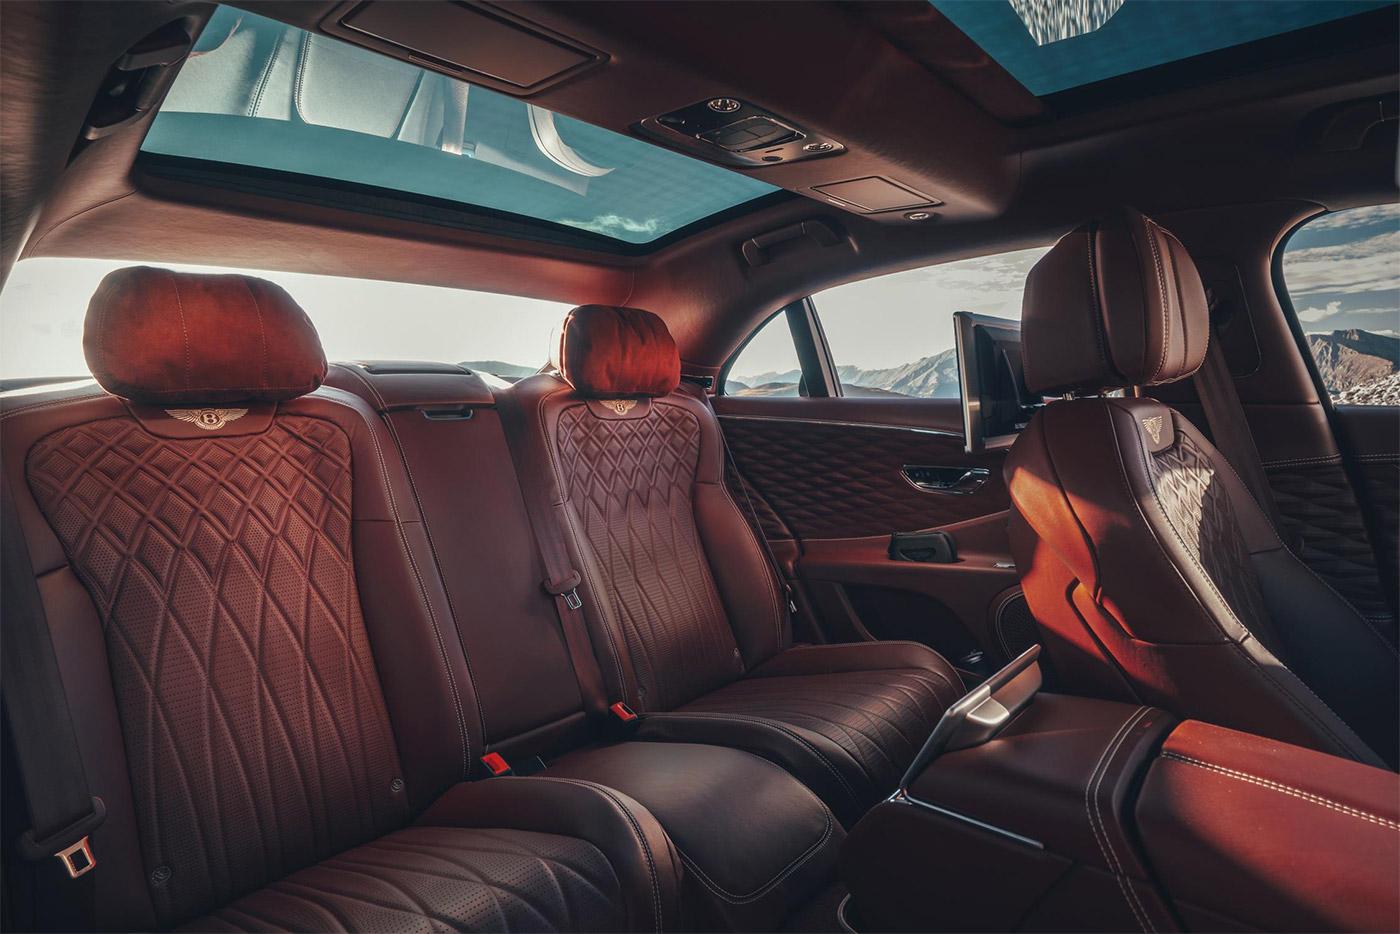 Bentley Flying Spur Rear Cabin Options